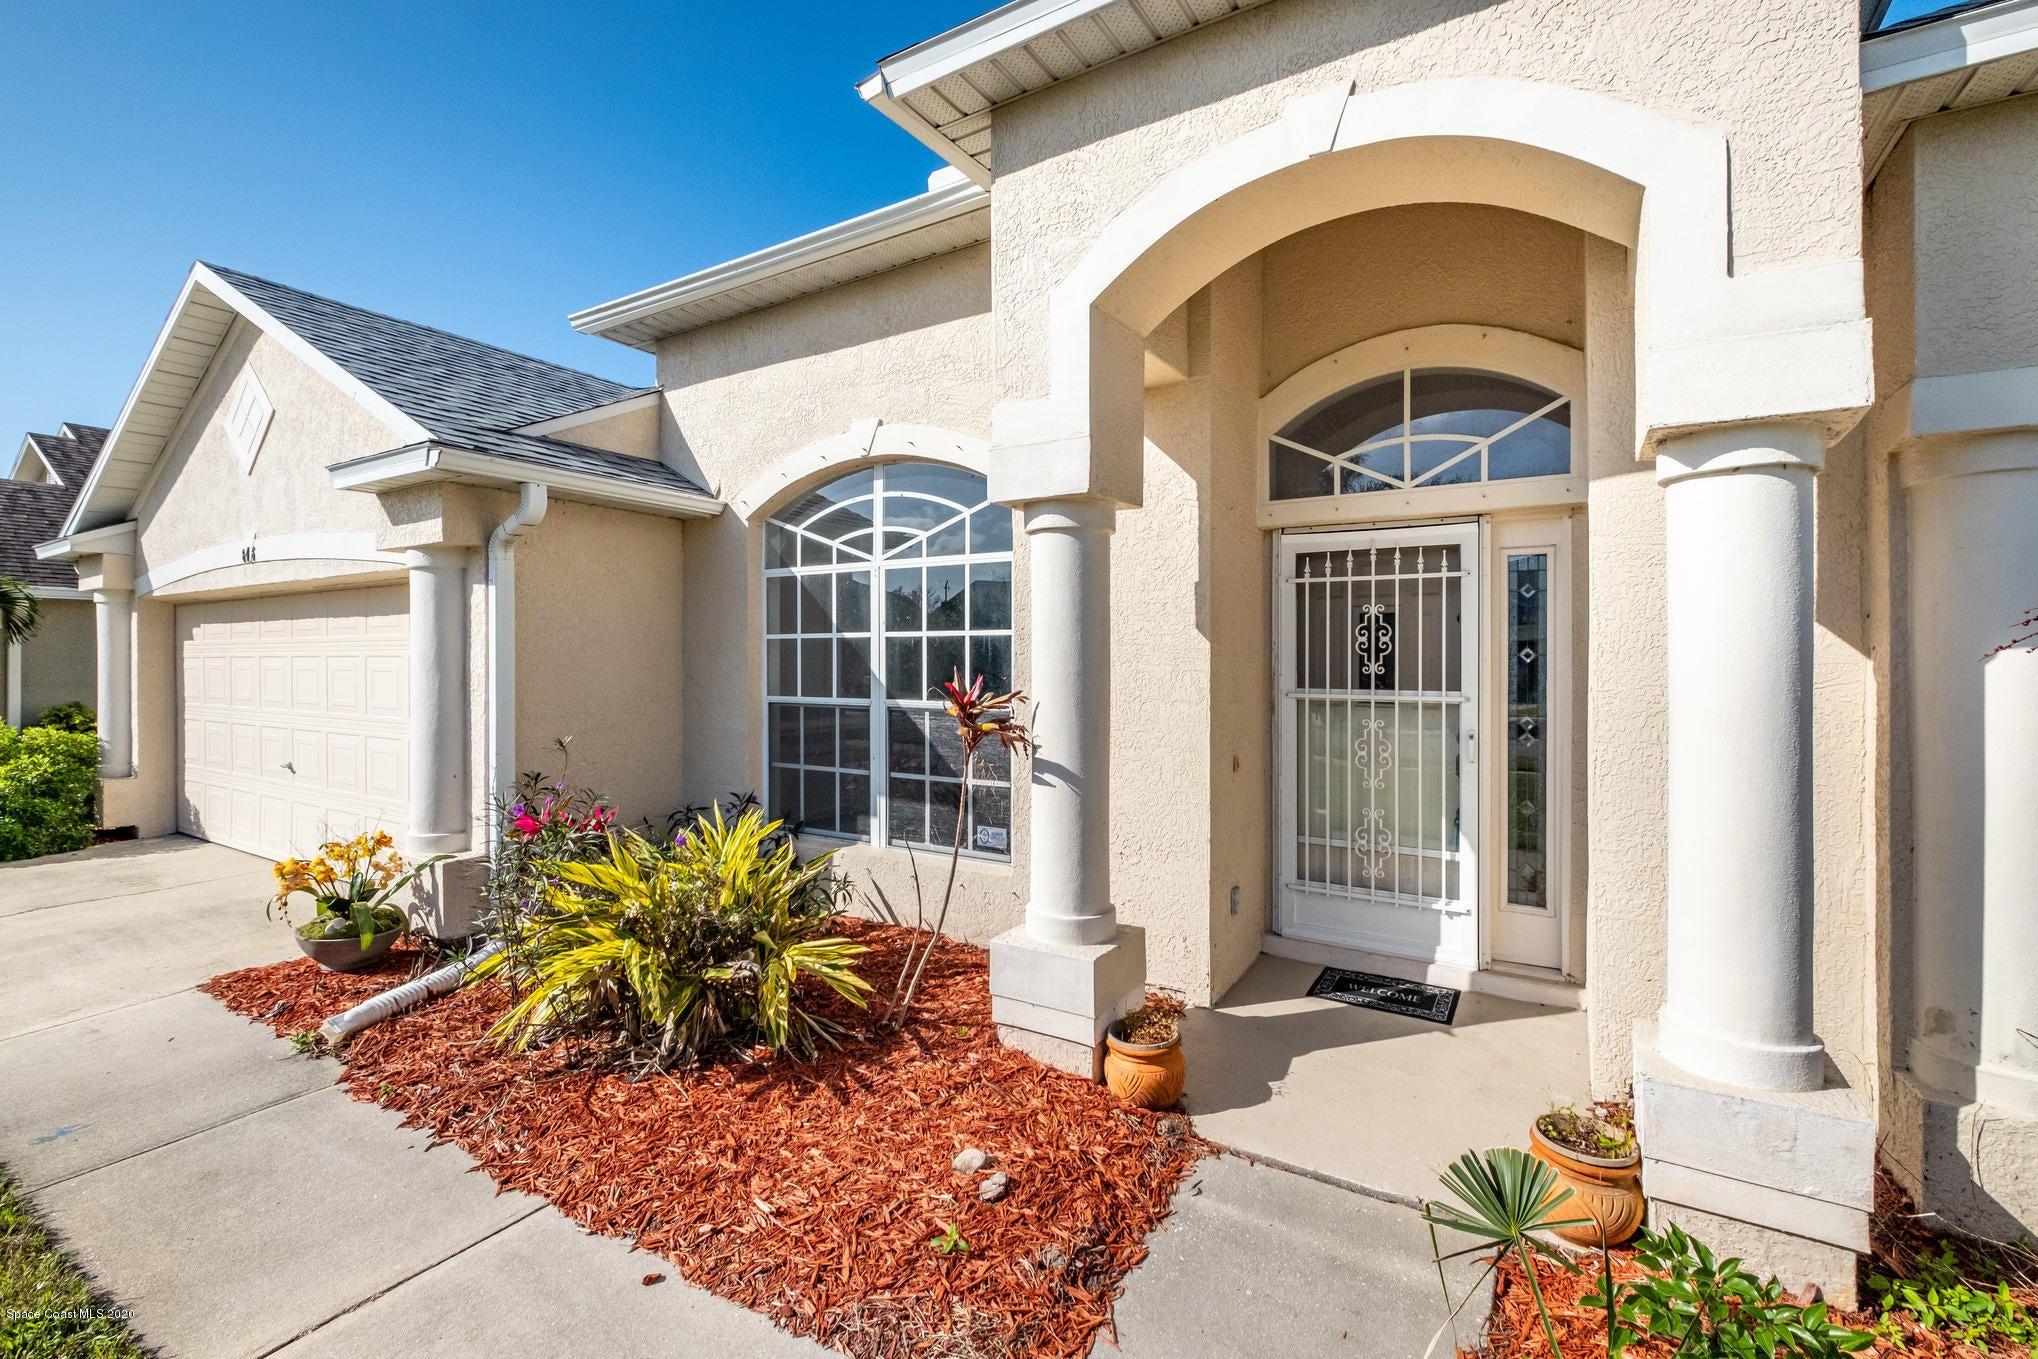 646 Heather Stone Drive, Merritt Island, FL 32953